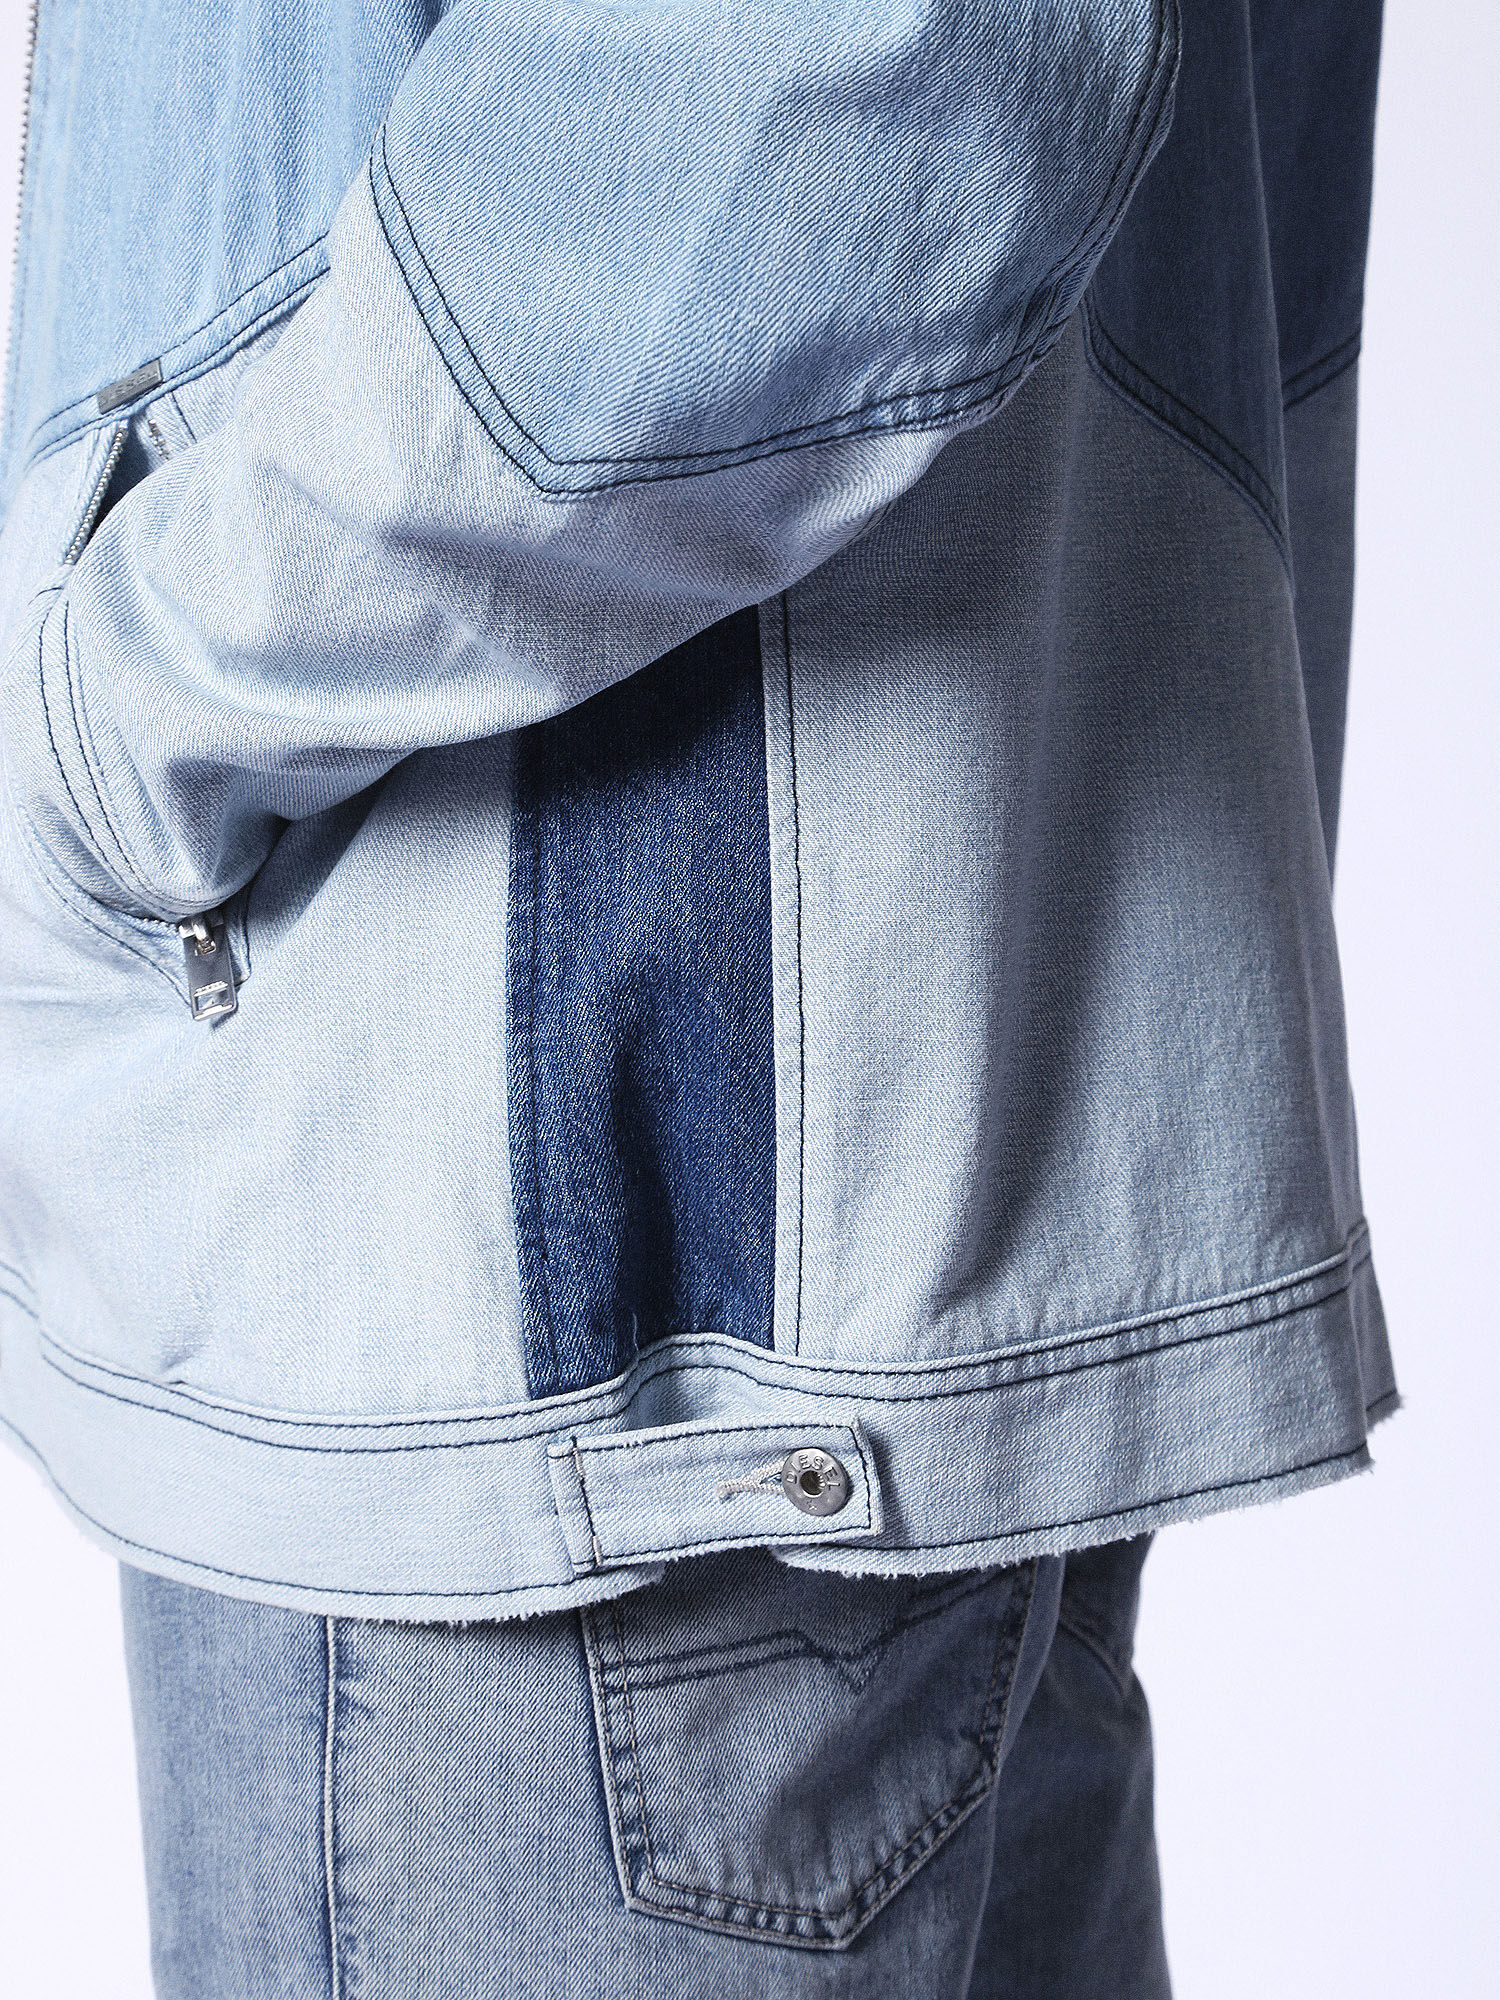 00SX250PAPG Jackets Man D-OLAF by Diesel Blue jeans